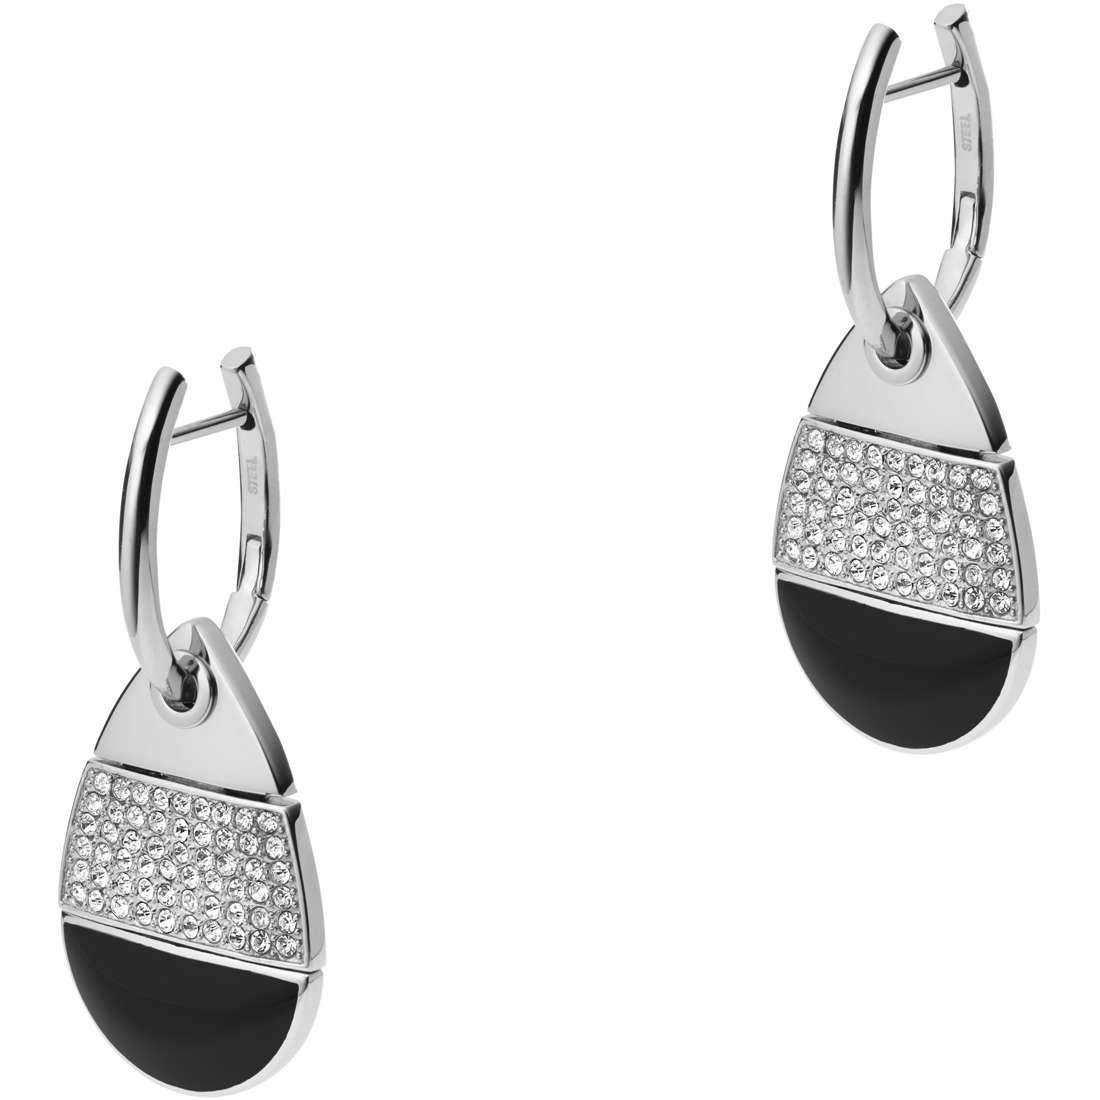 ear-rings woman jewellery Emporio Armani Fall 2013 EGS1774040